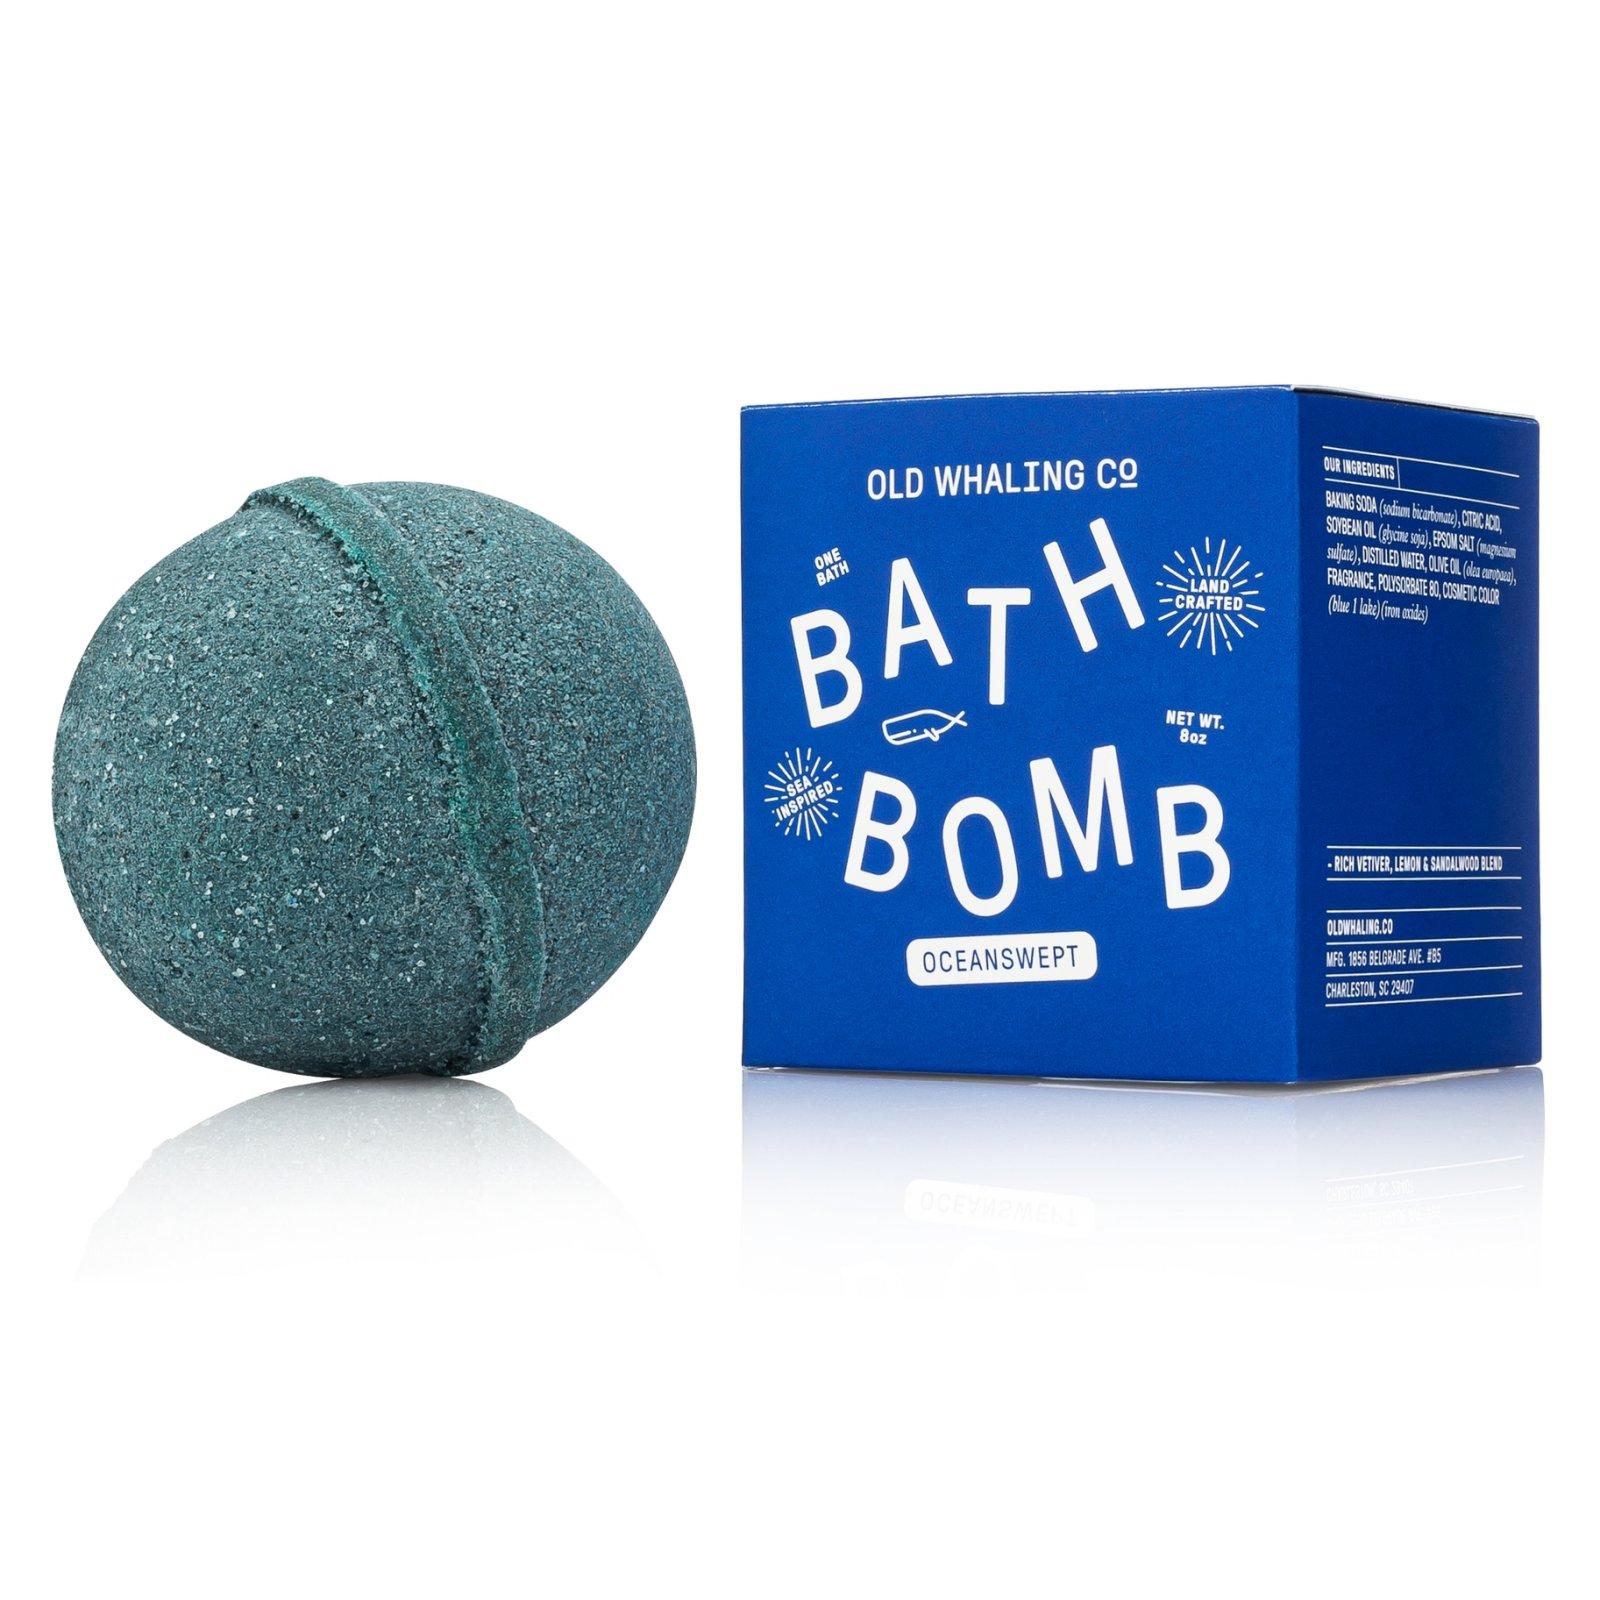 Bath Bomb Oceanswept 8 oz